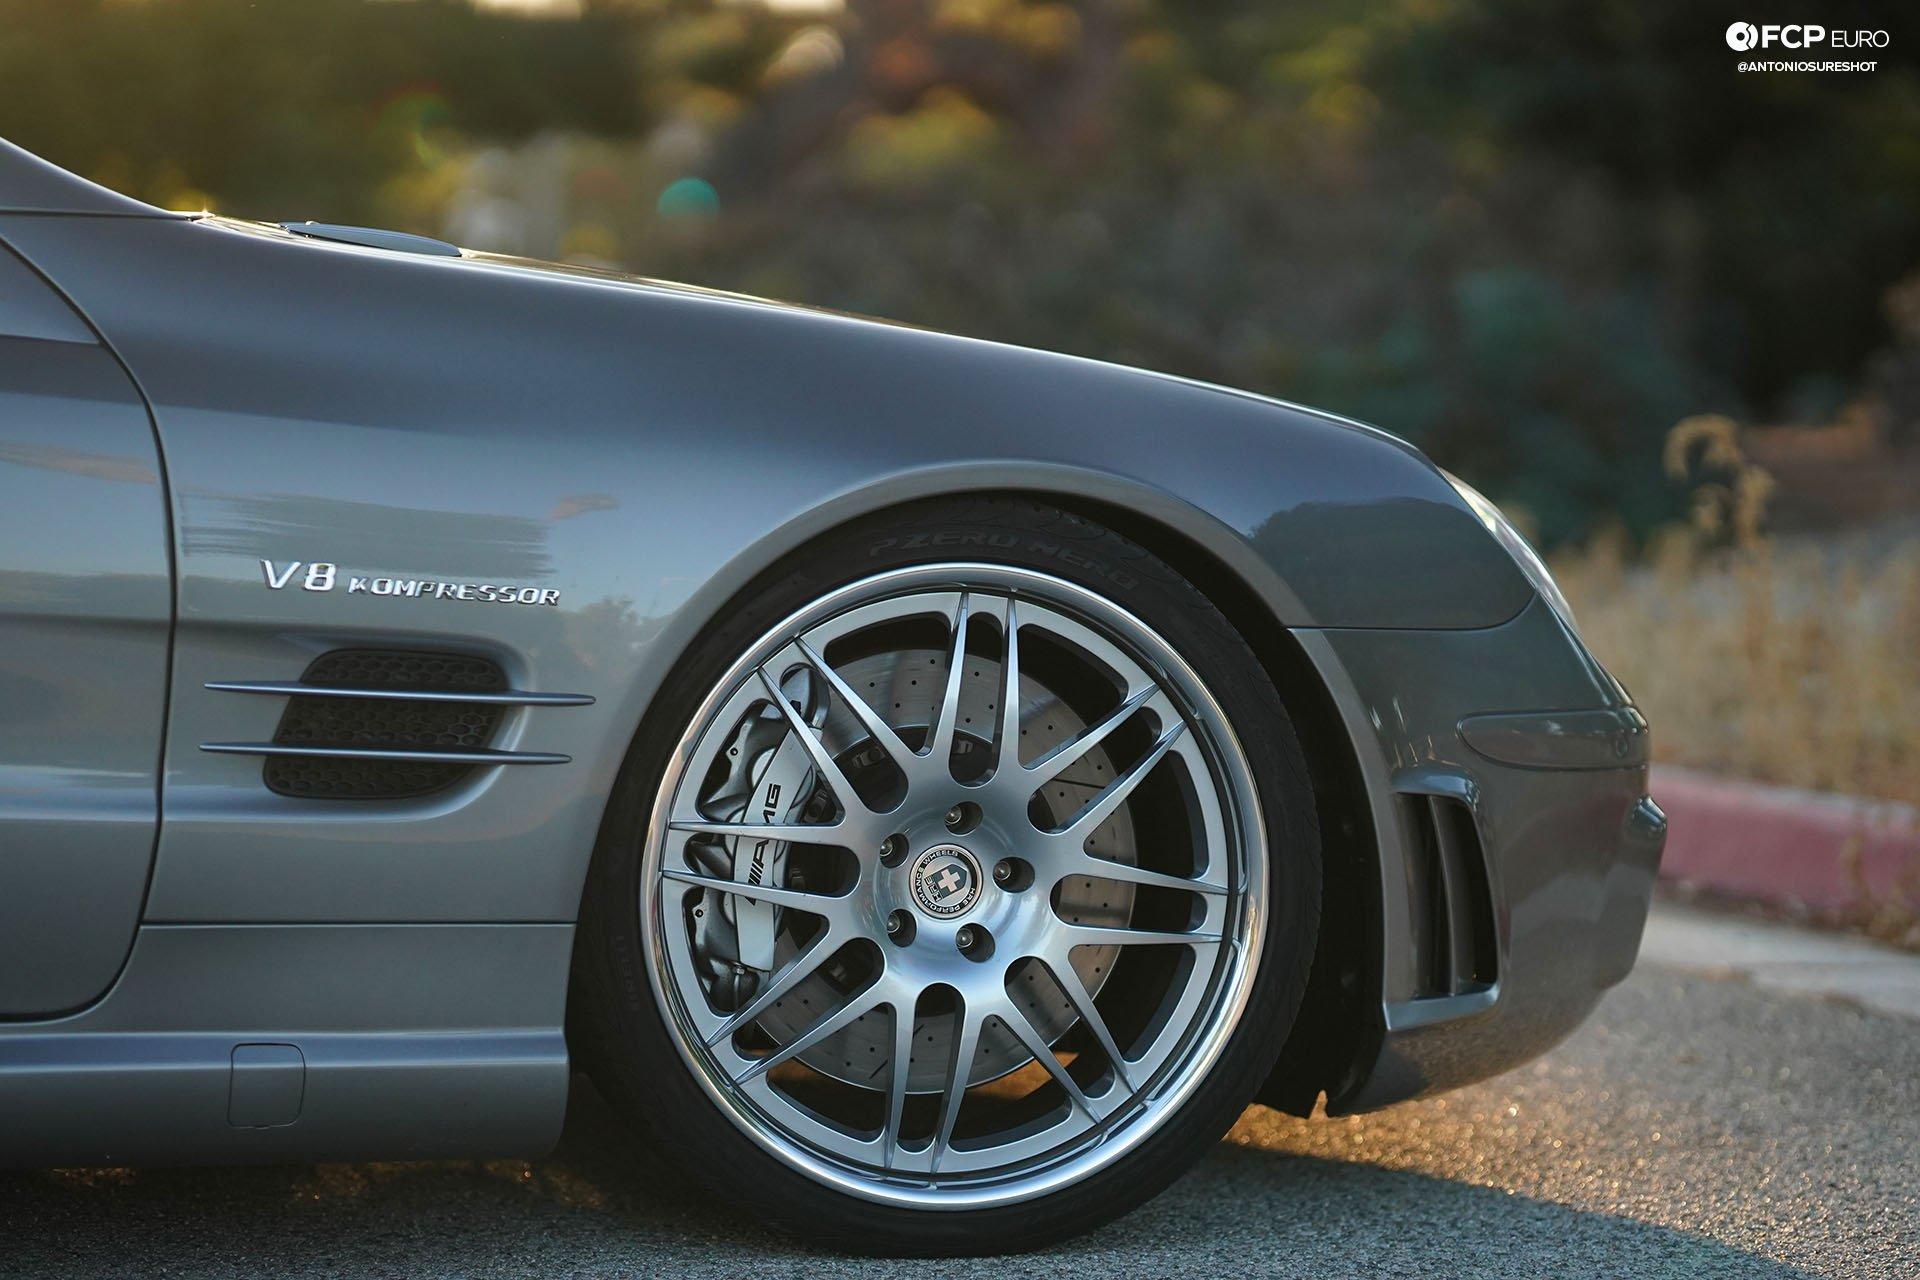 AMG SL55 030 roadster Weistec supercharger HRE wheels Wavetrac LSD